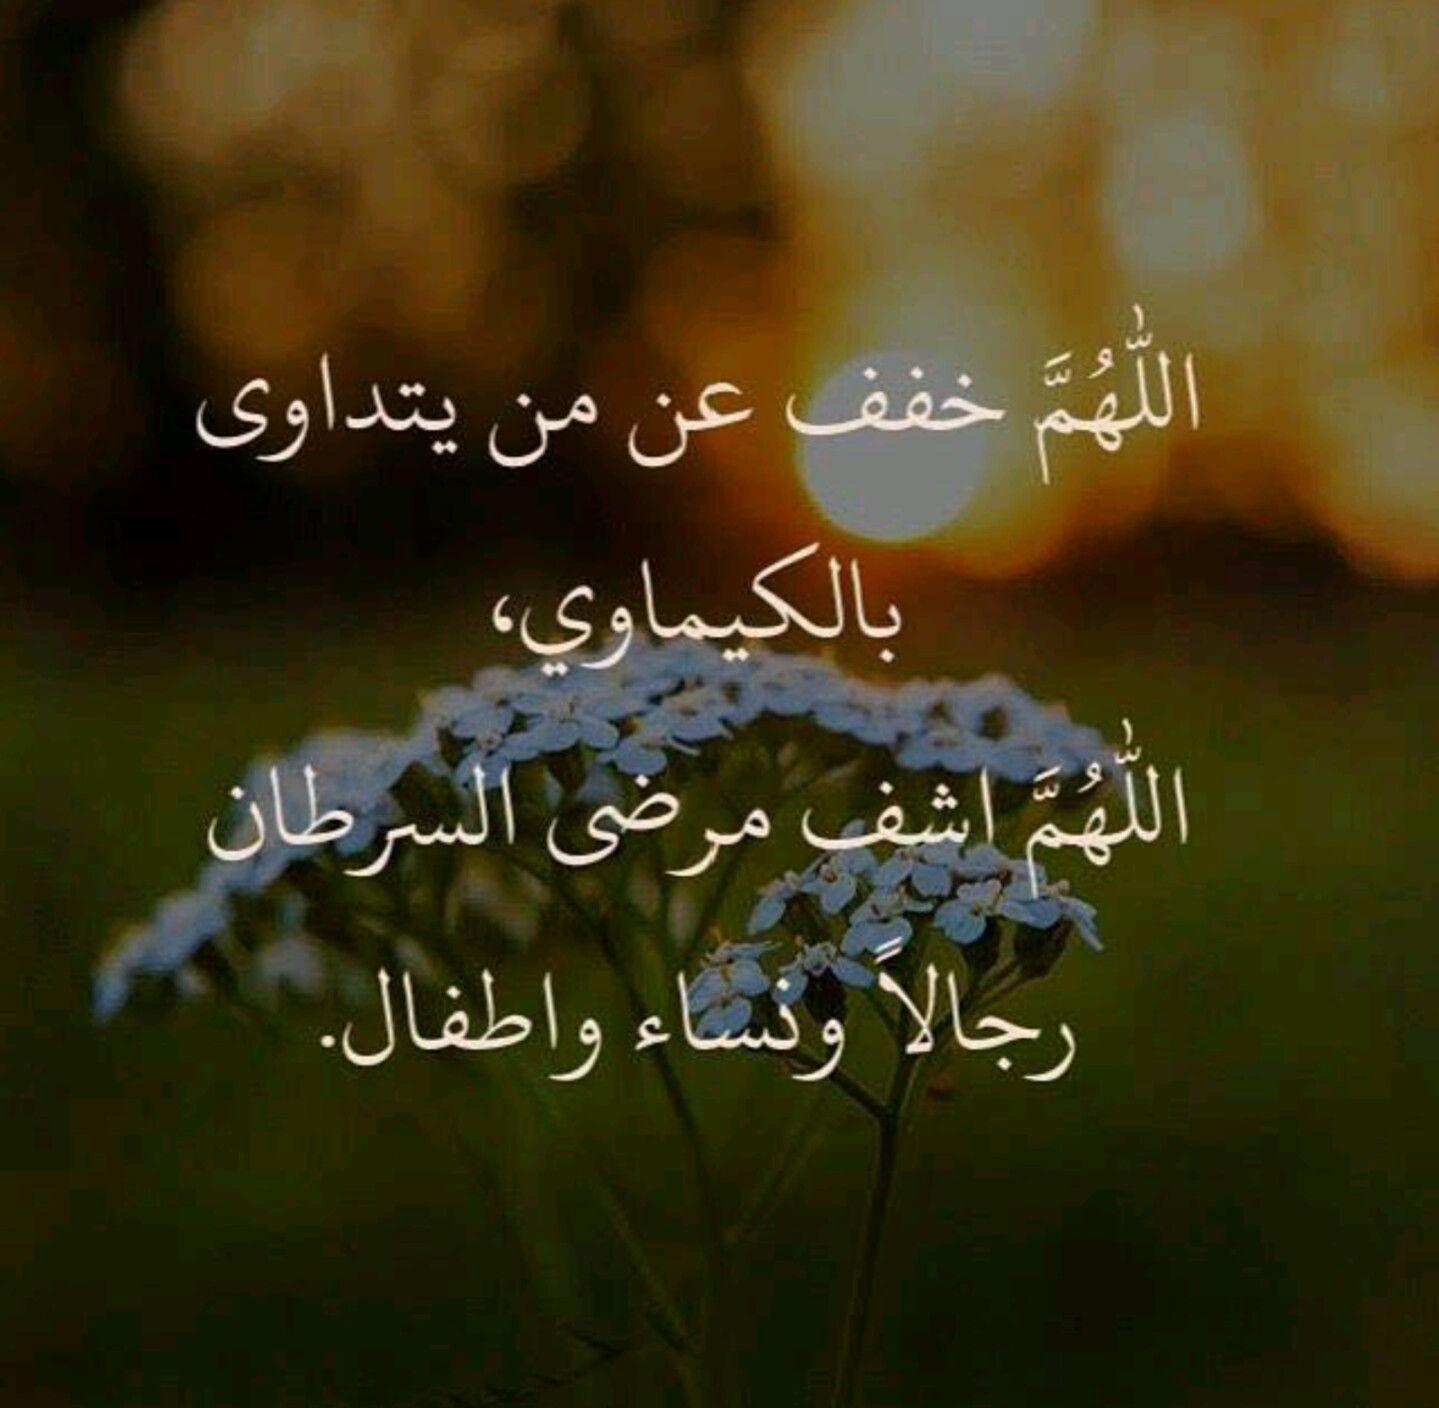 Pin By جوهرة الروح On مختارات دينيه Arabic Calligraphy Lockscreen